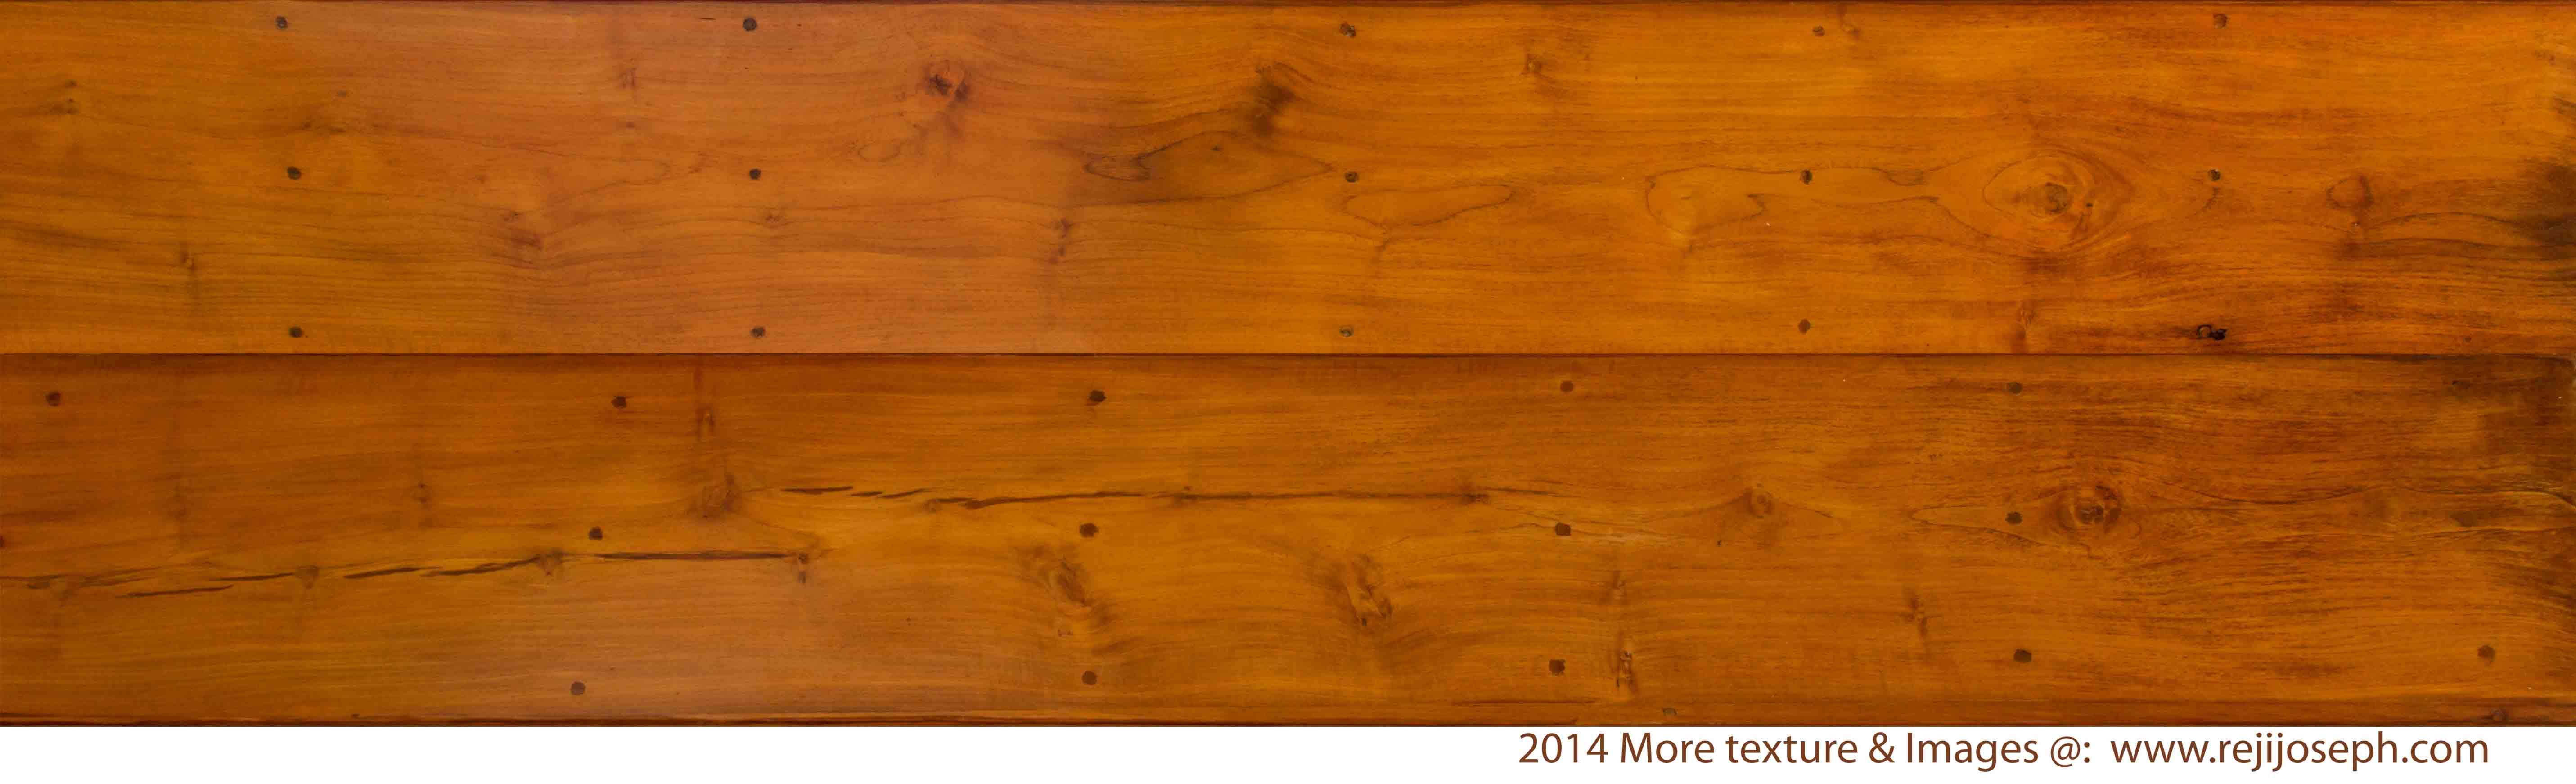 Plane Wood texture 00001